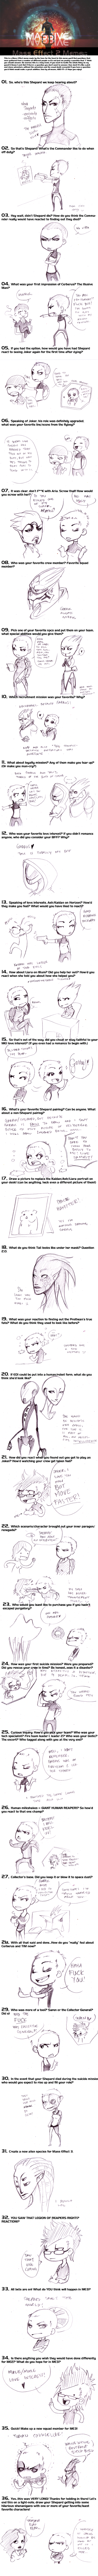 Massive Mass Effect Meme by erli